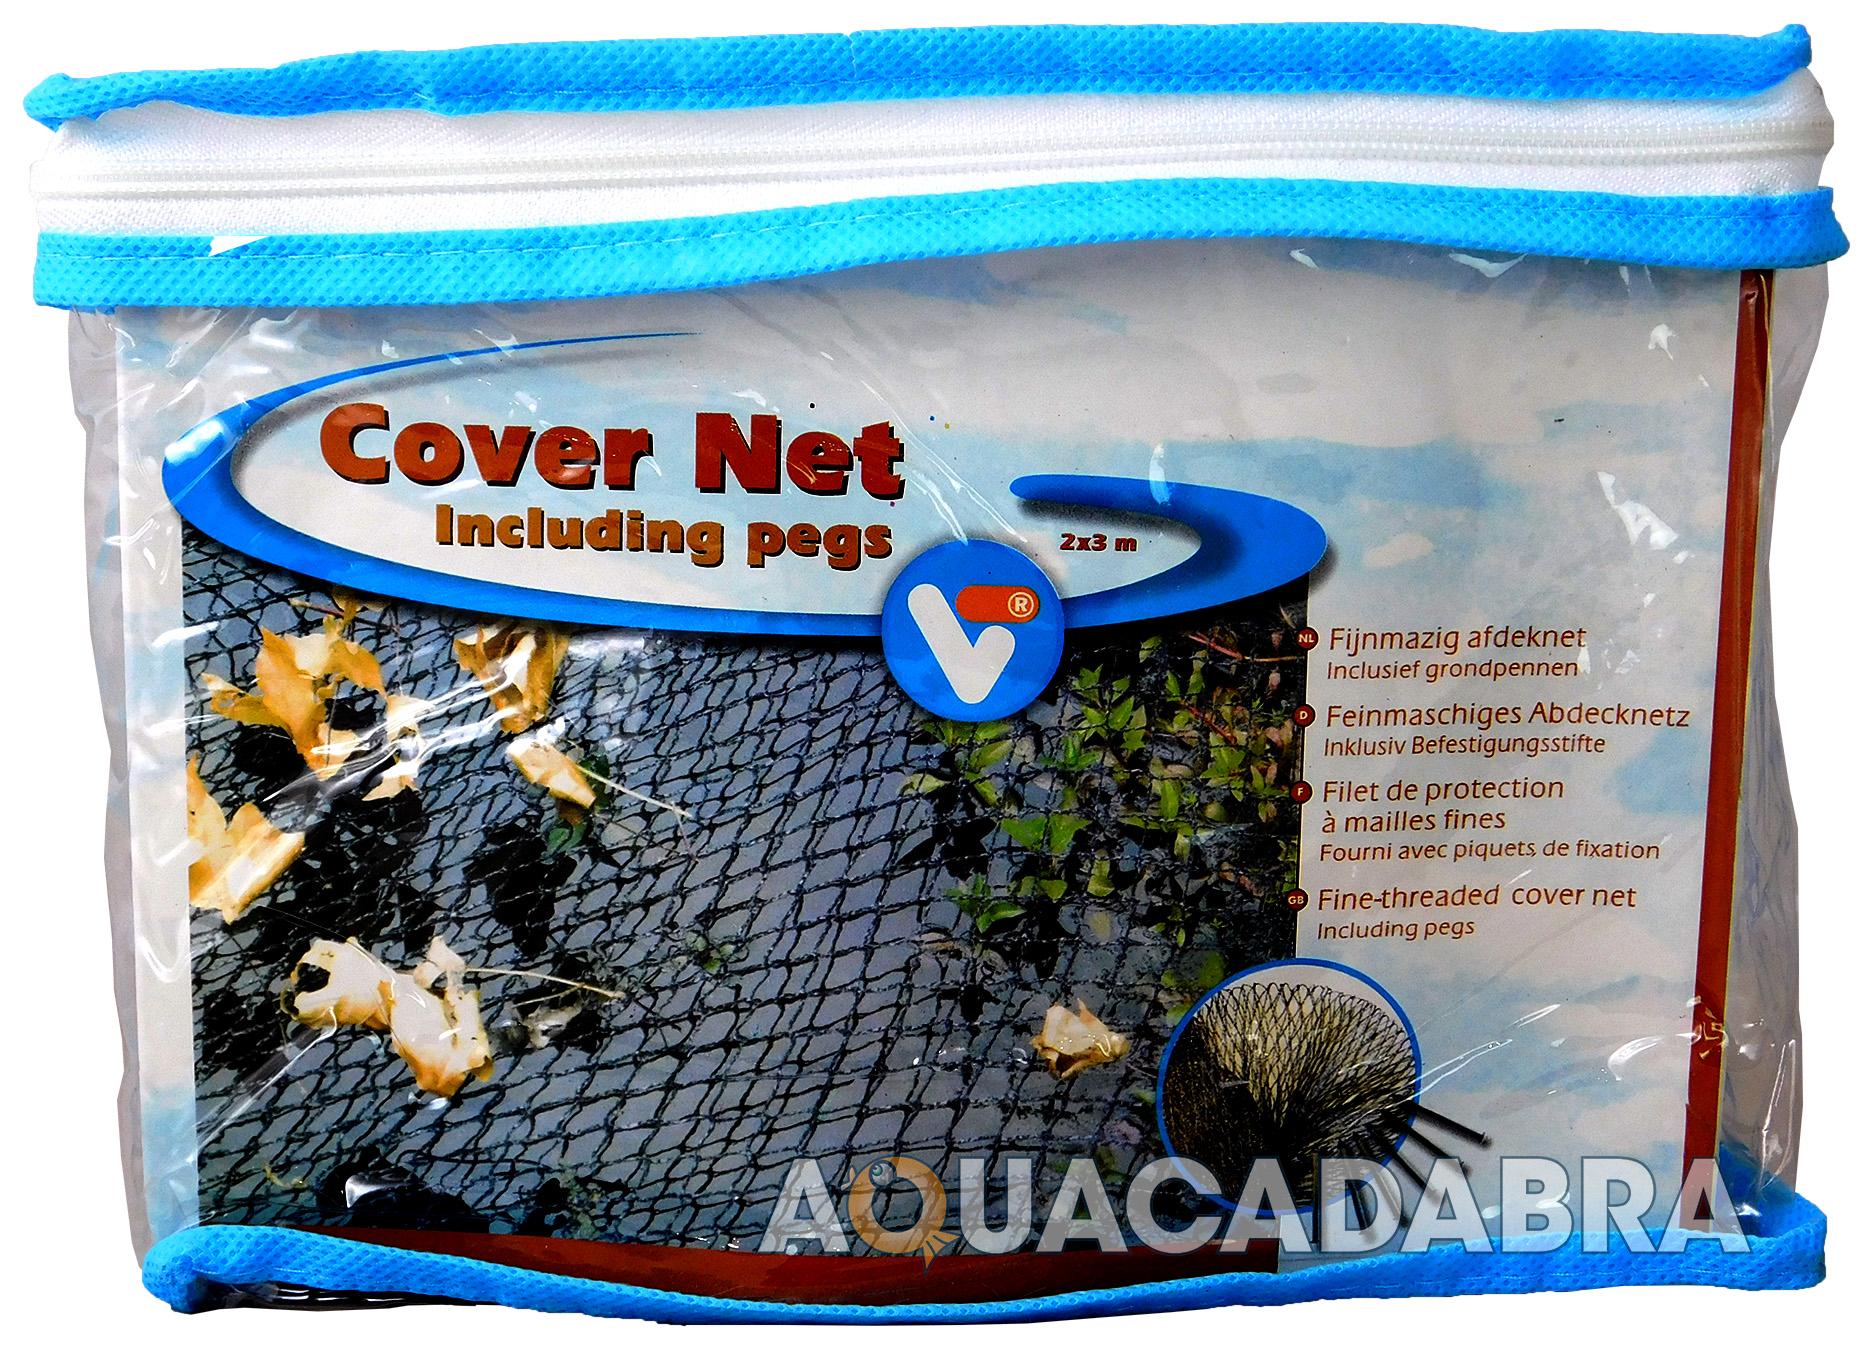 Velda garden fish pond cover net netting heron cat fox for Garden pond netting cover